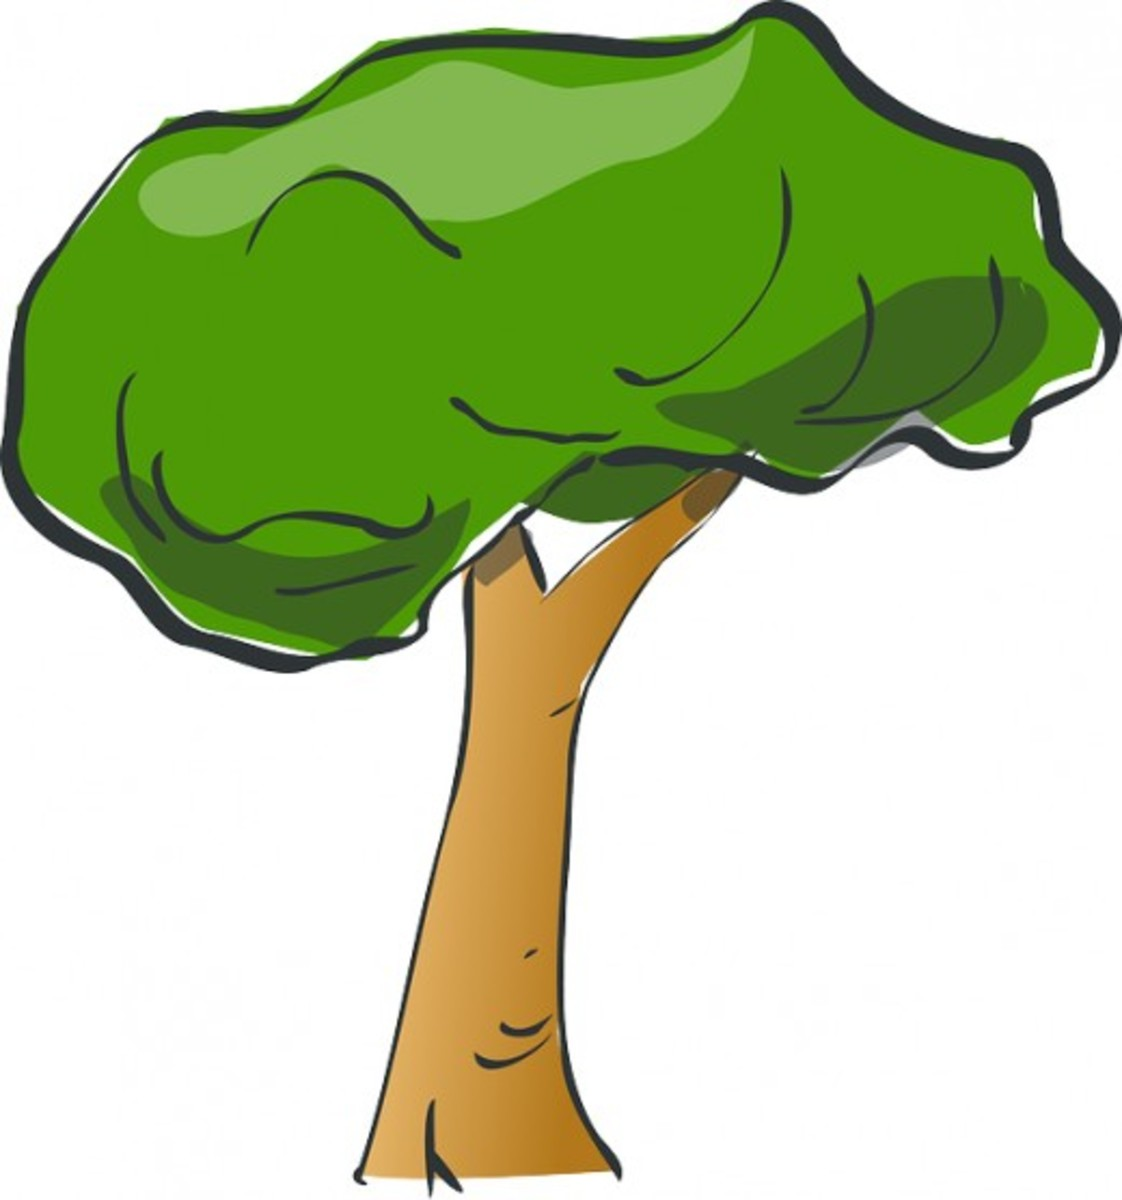 Two-Tone Green Tree